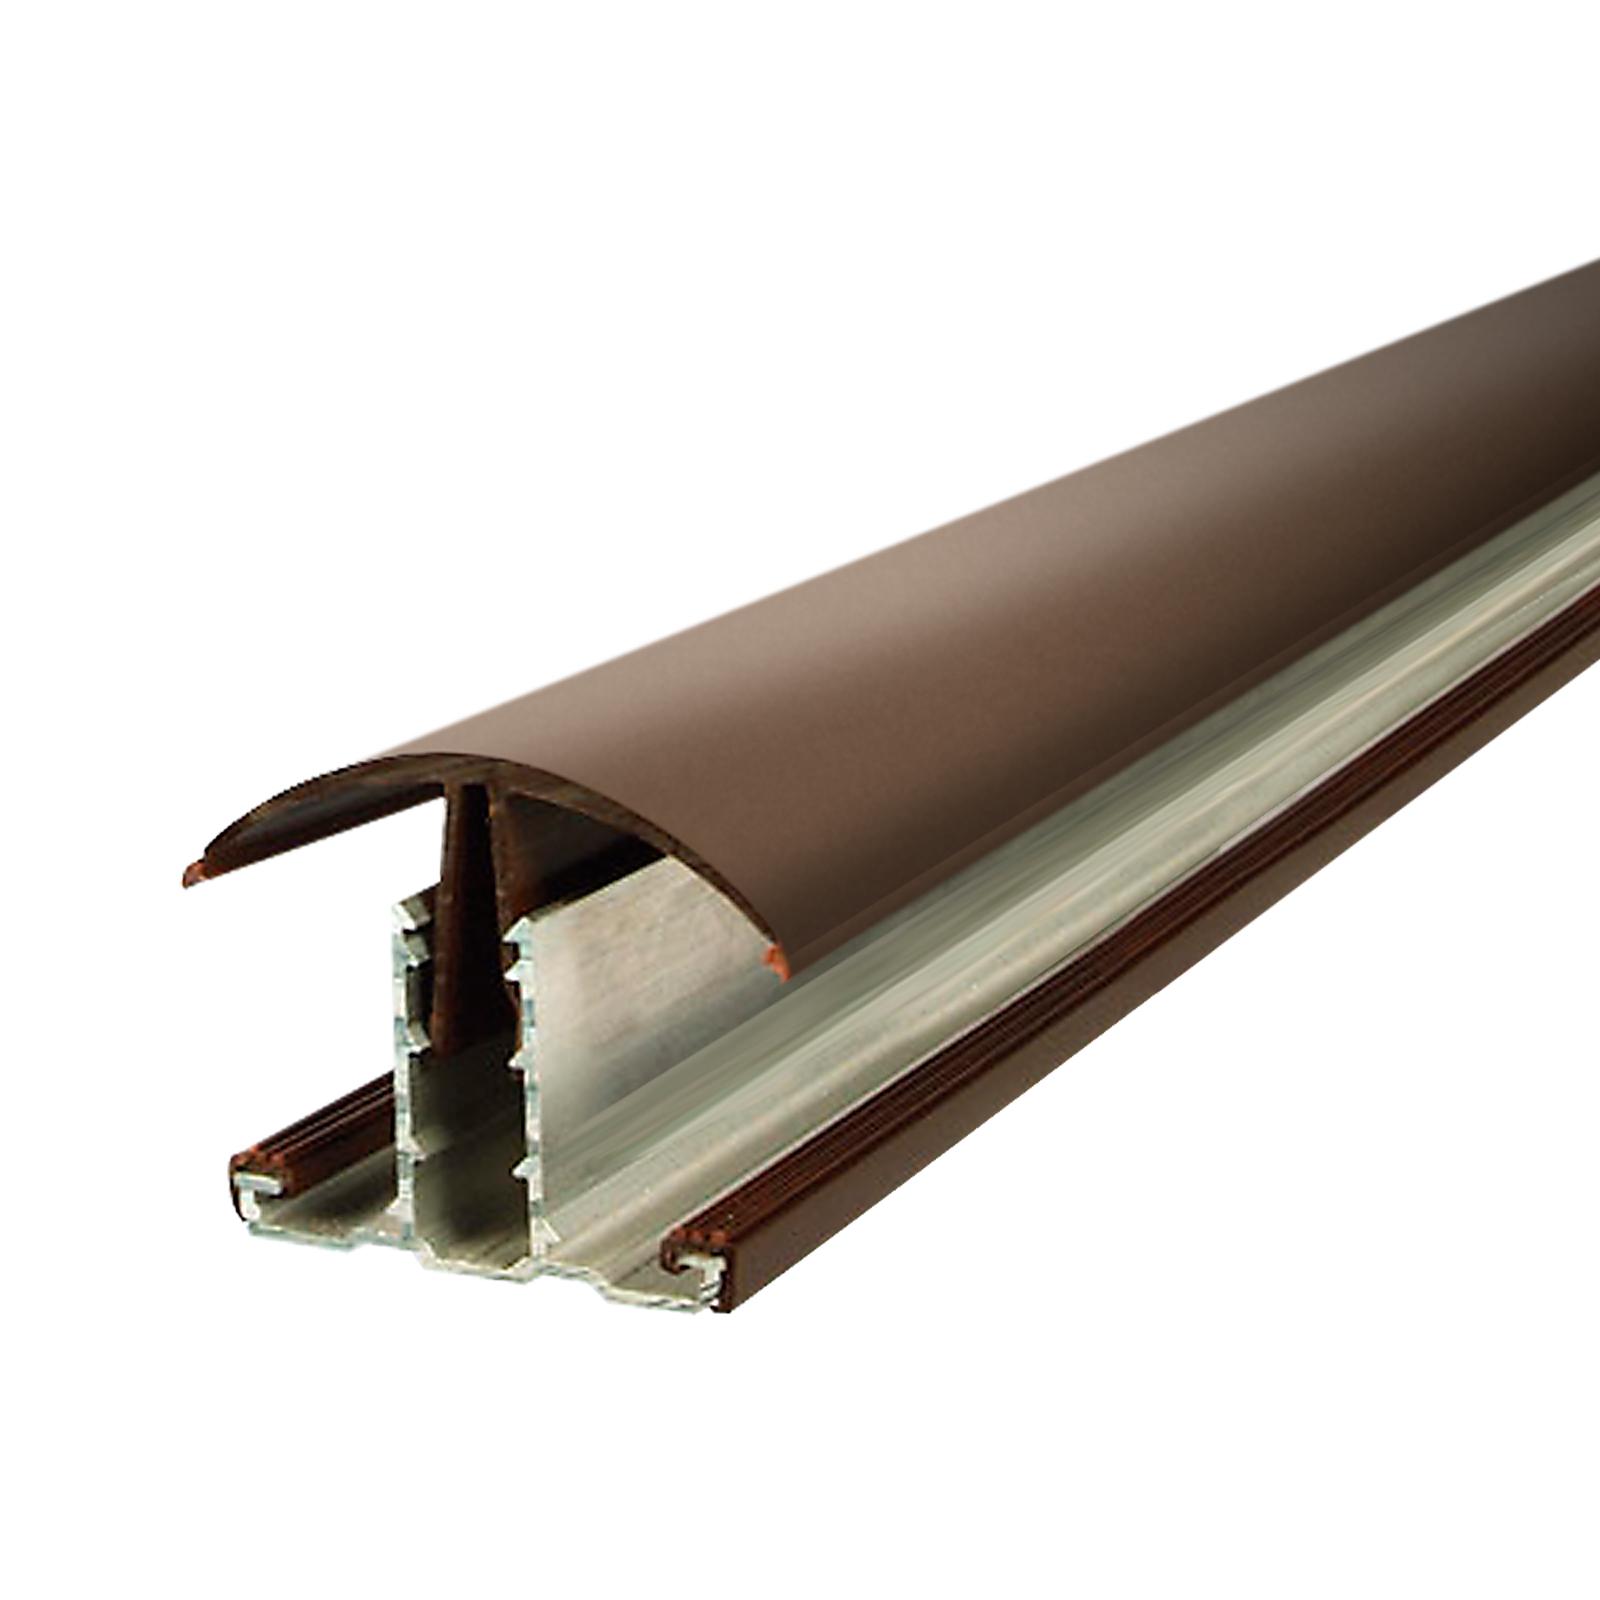 4m Sunwood Snap Tight 25gb Glazing Hip Bar Truly Pvc